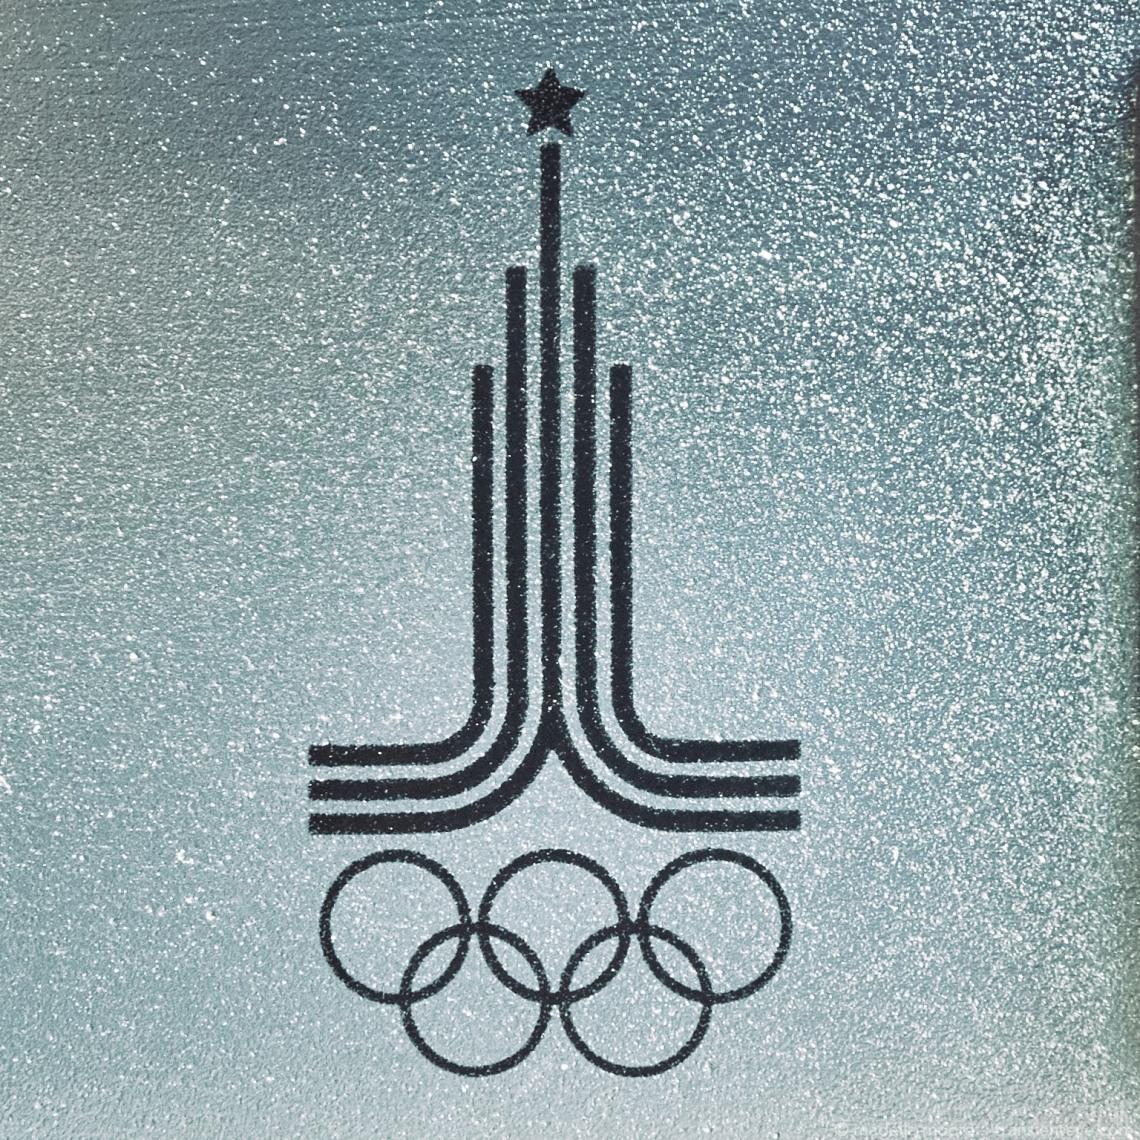 FED 5b Soviet Rangfinder - Olympic Logo